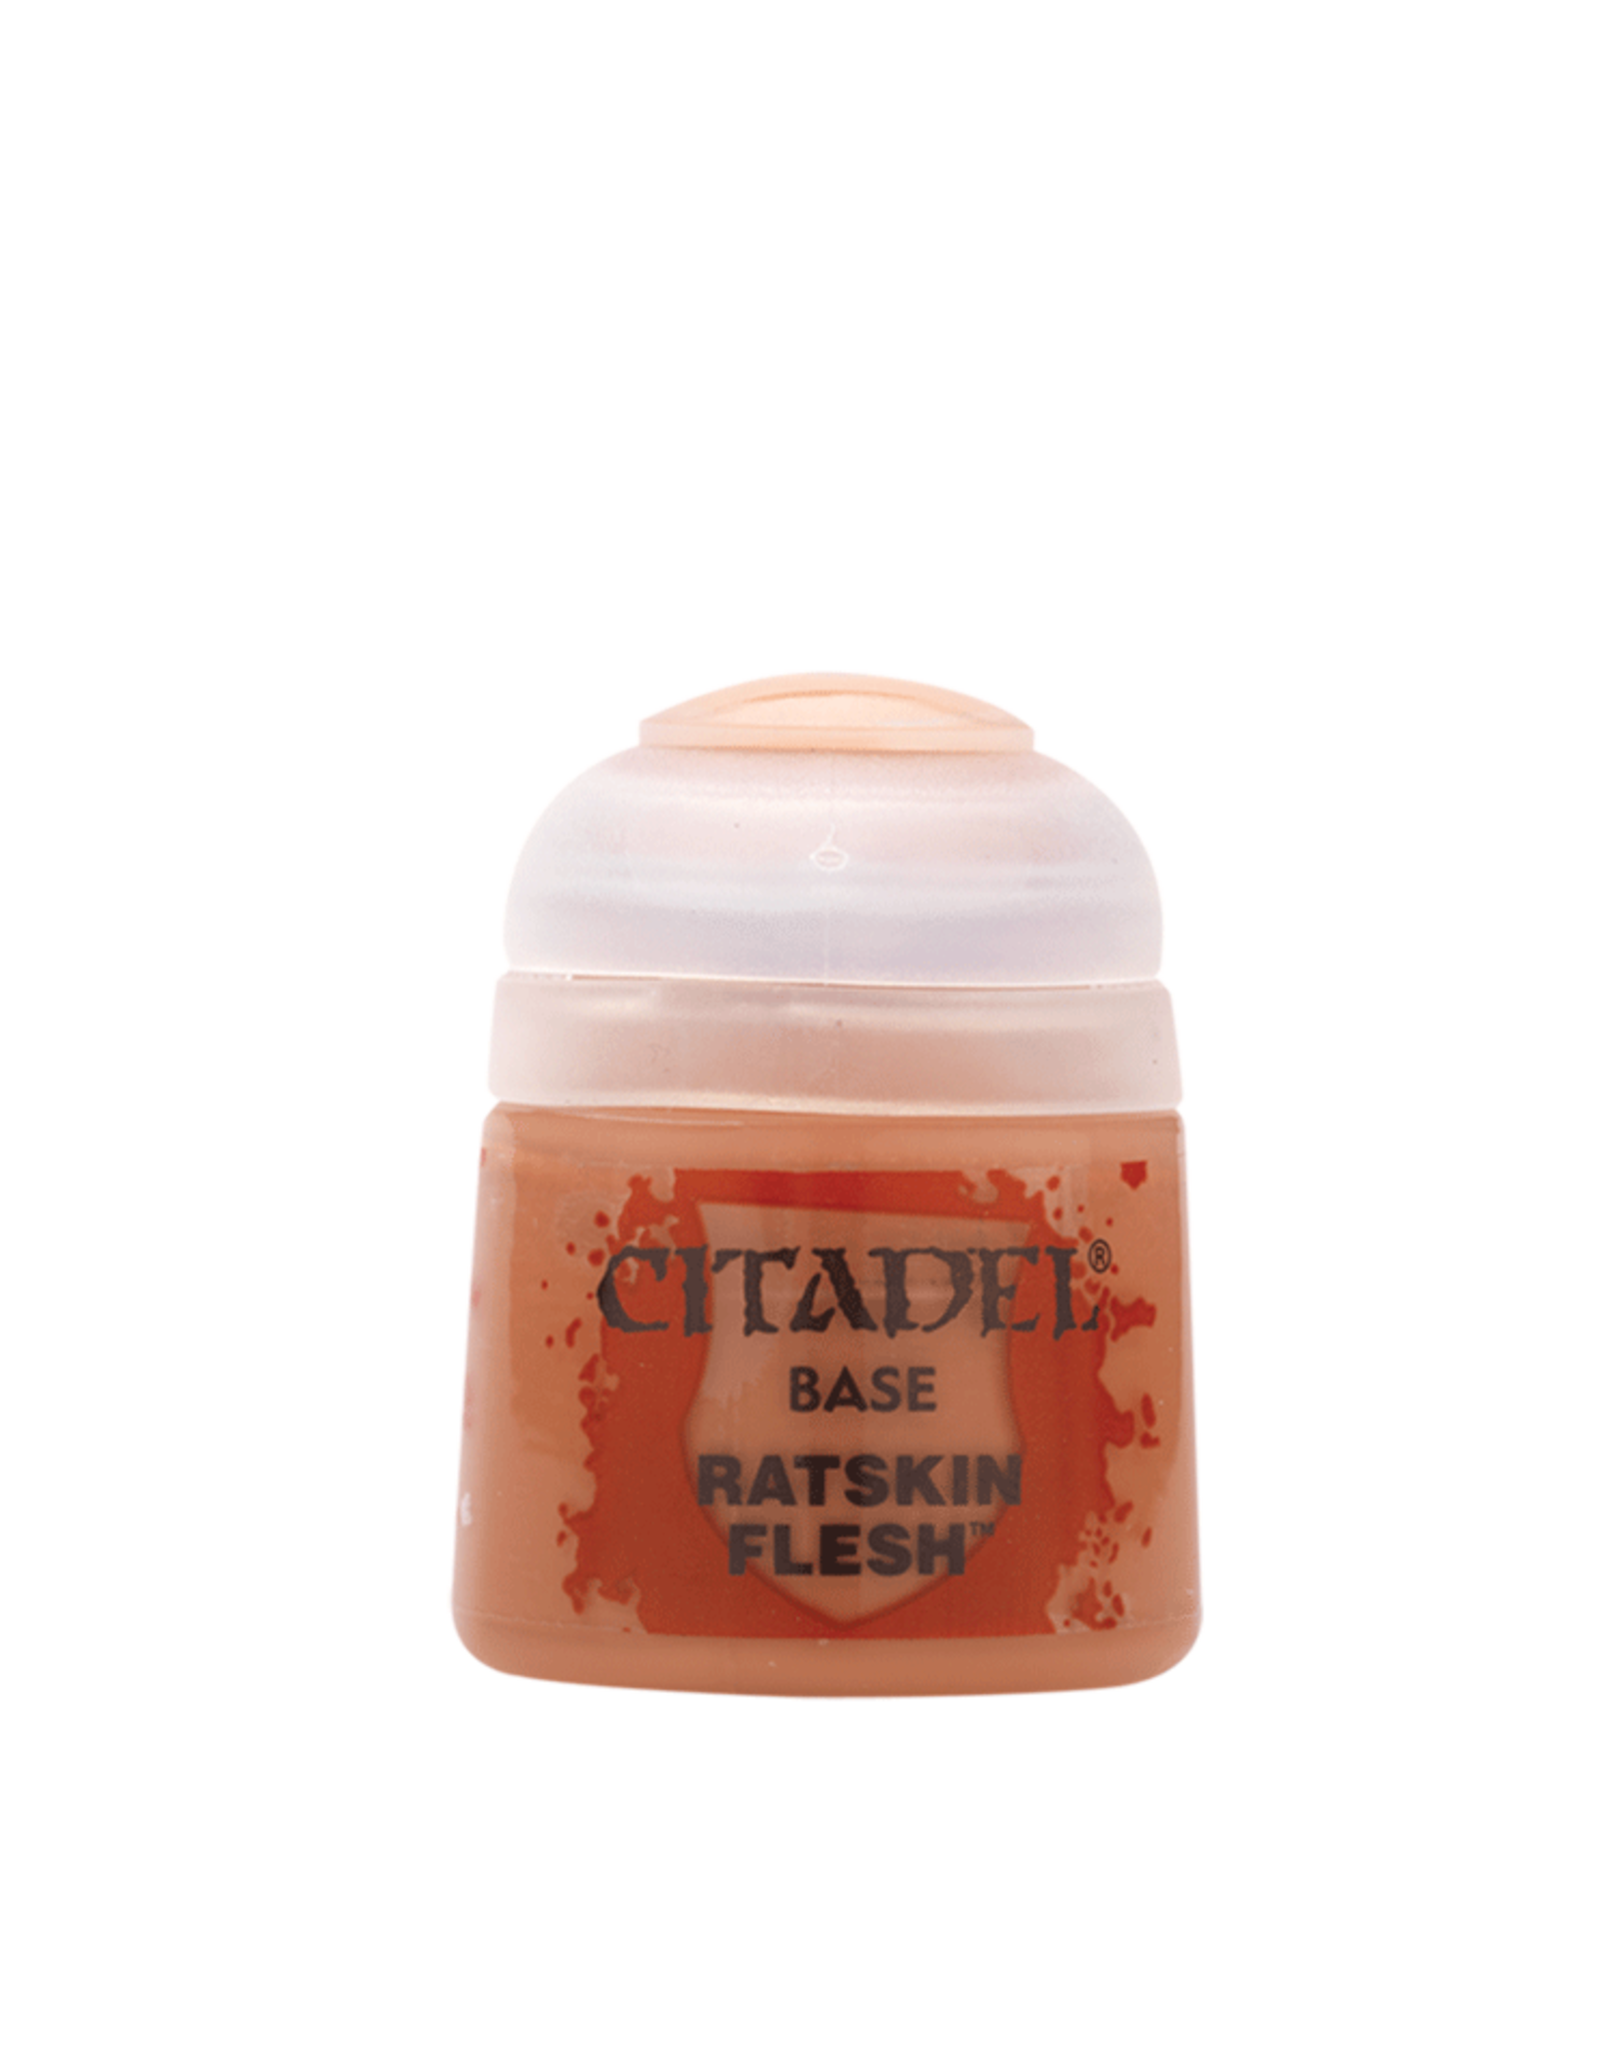 Citadel Citadel Base: Ratskin Flesh (12ml)